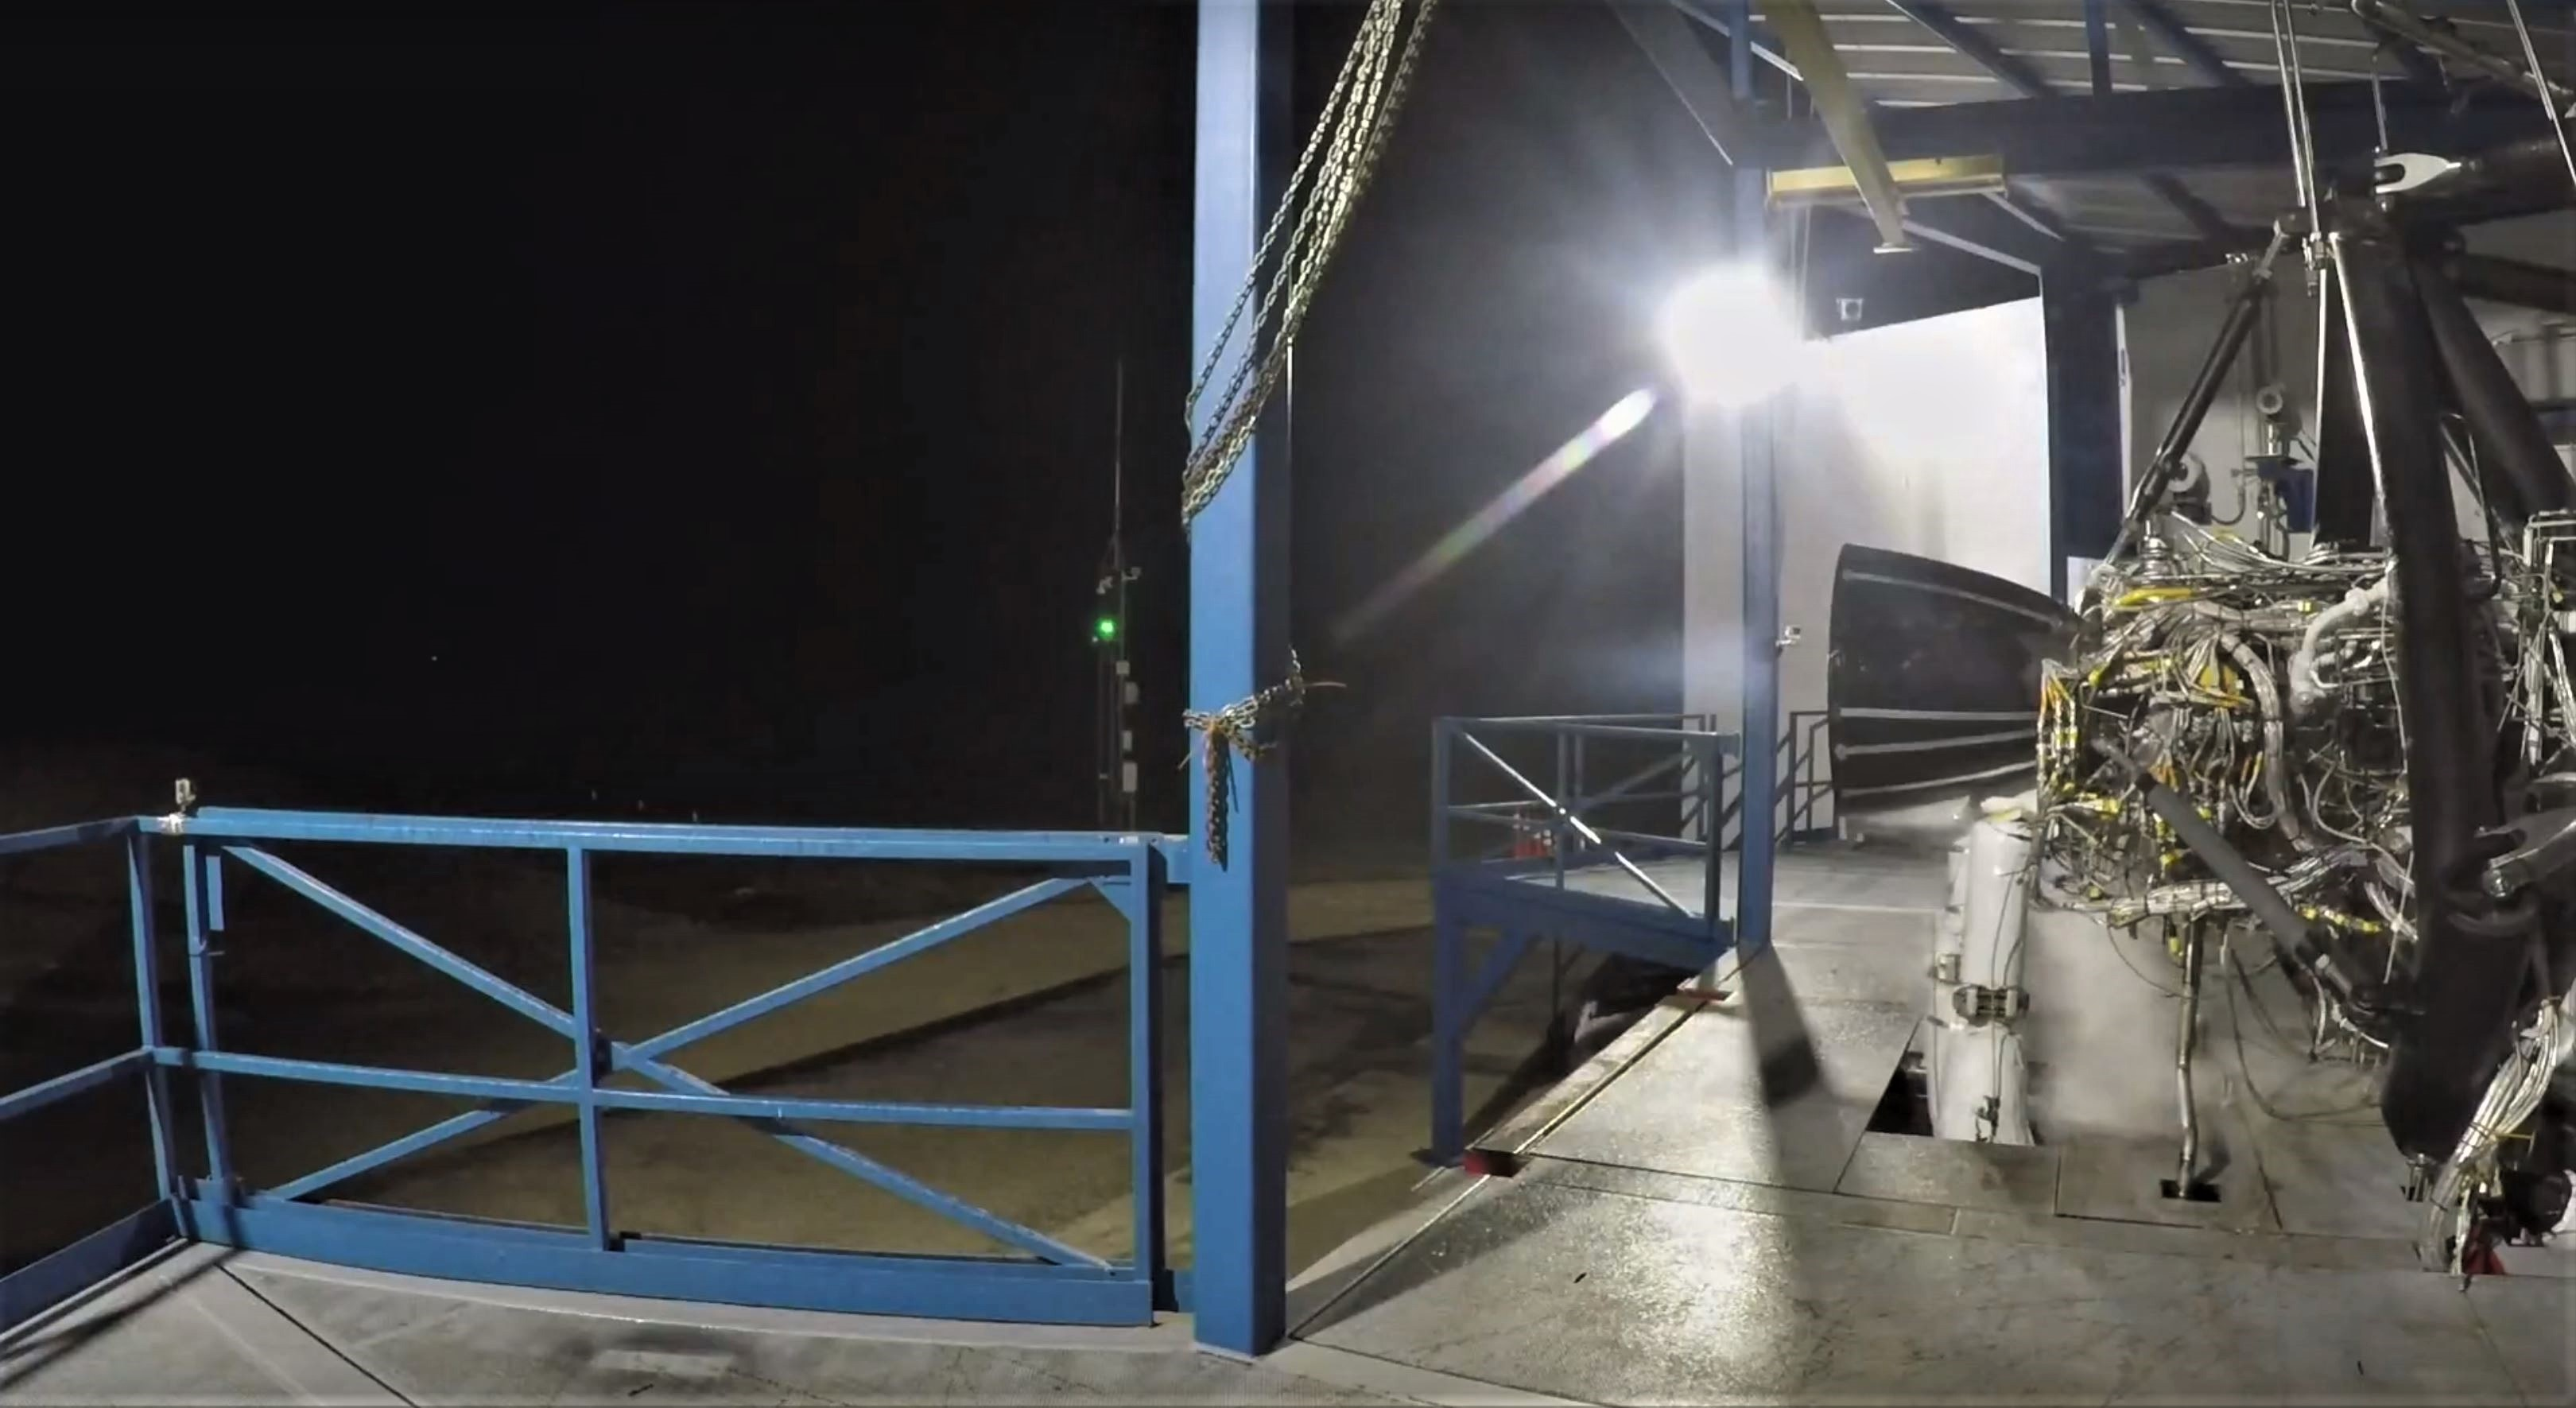 Raptor testing 2018 (SpaceX) gif 1